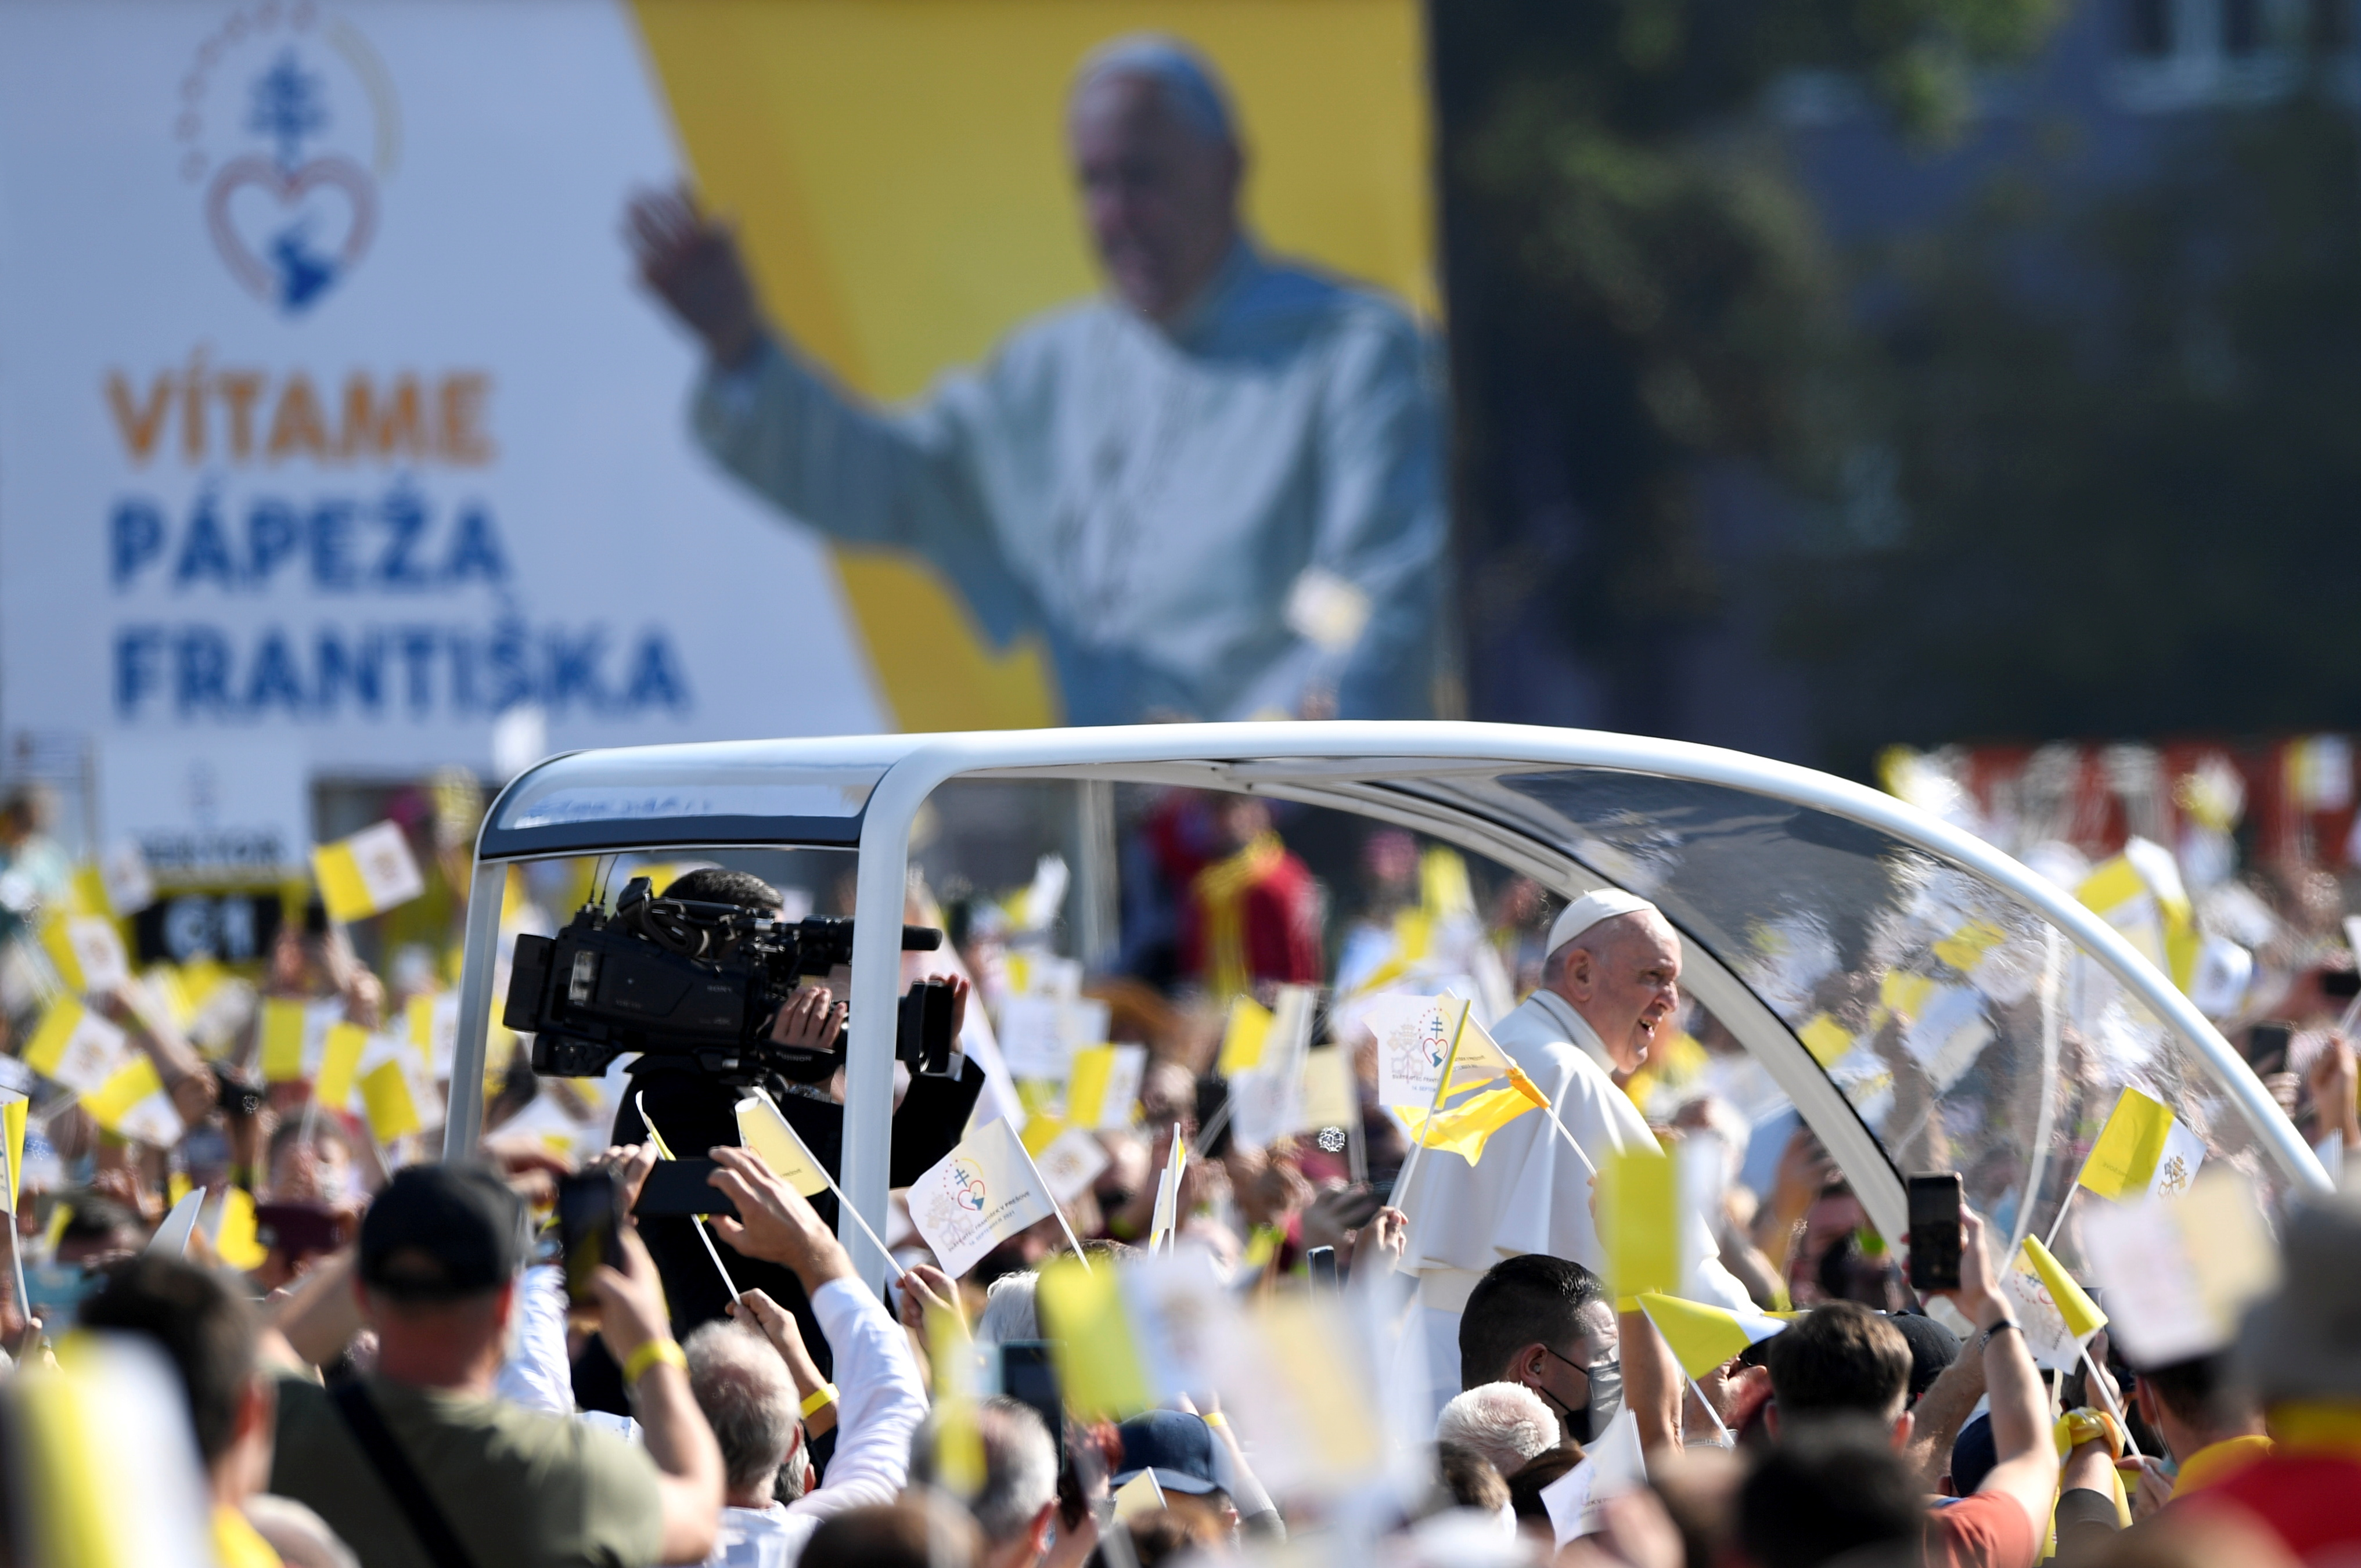 Pope Francis arrives to lead the Liturgy of Saint John Chrysostom in Presov, Slovakia, September 14, 2021. REUTERS/Radovan Stoklasa